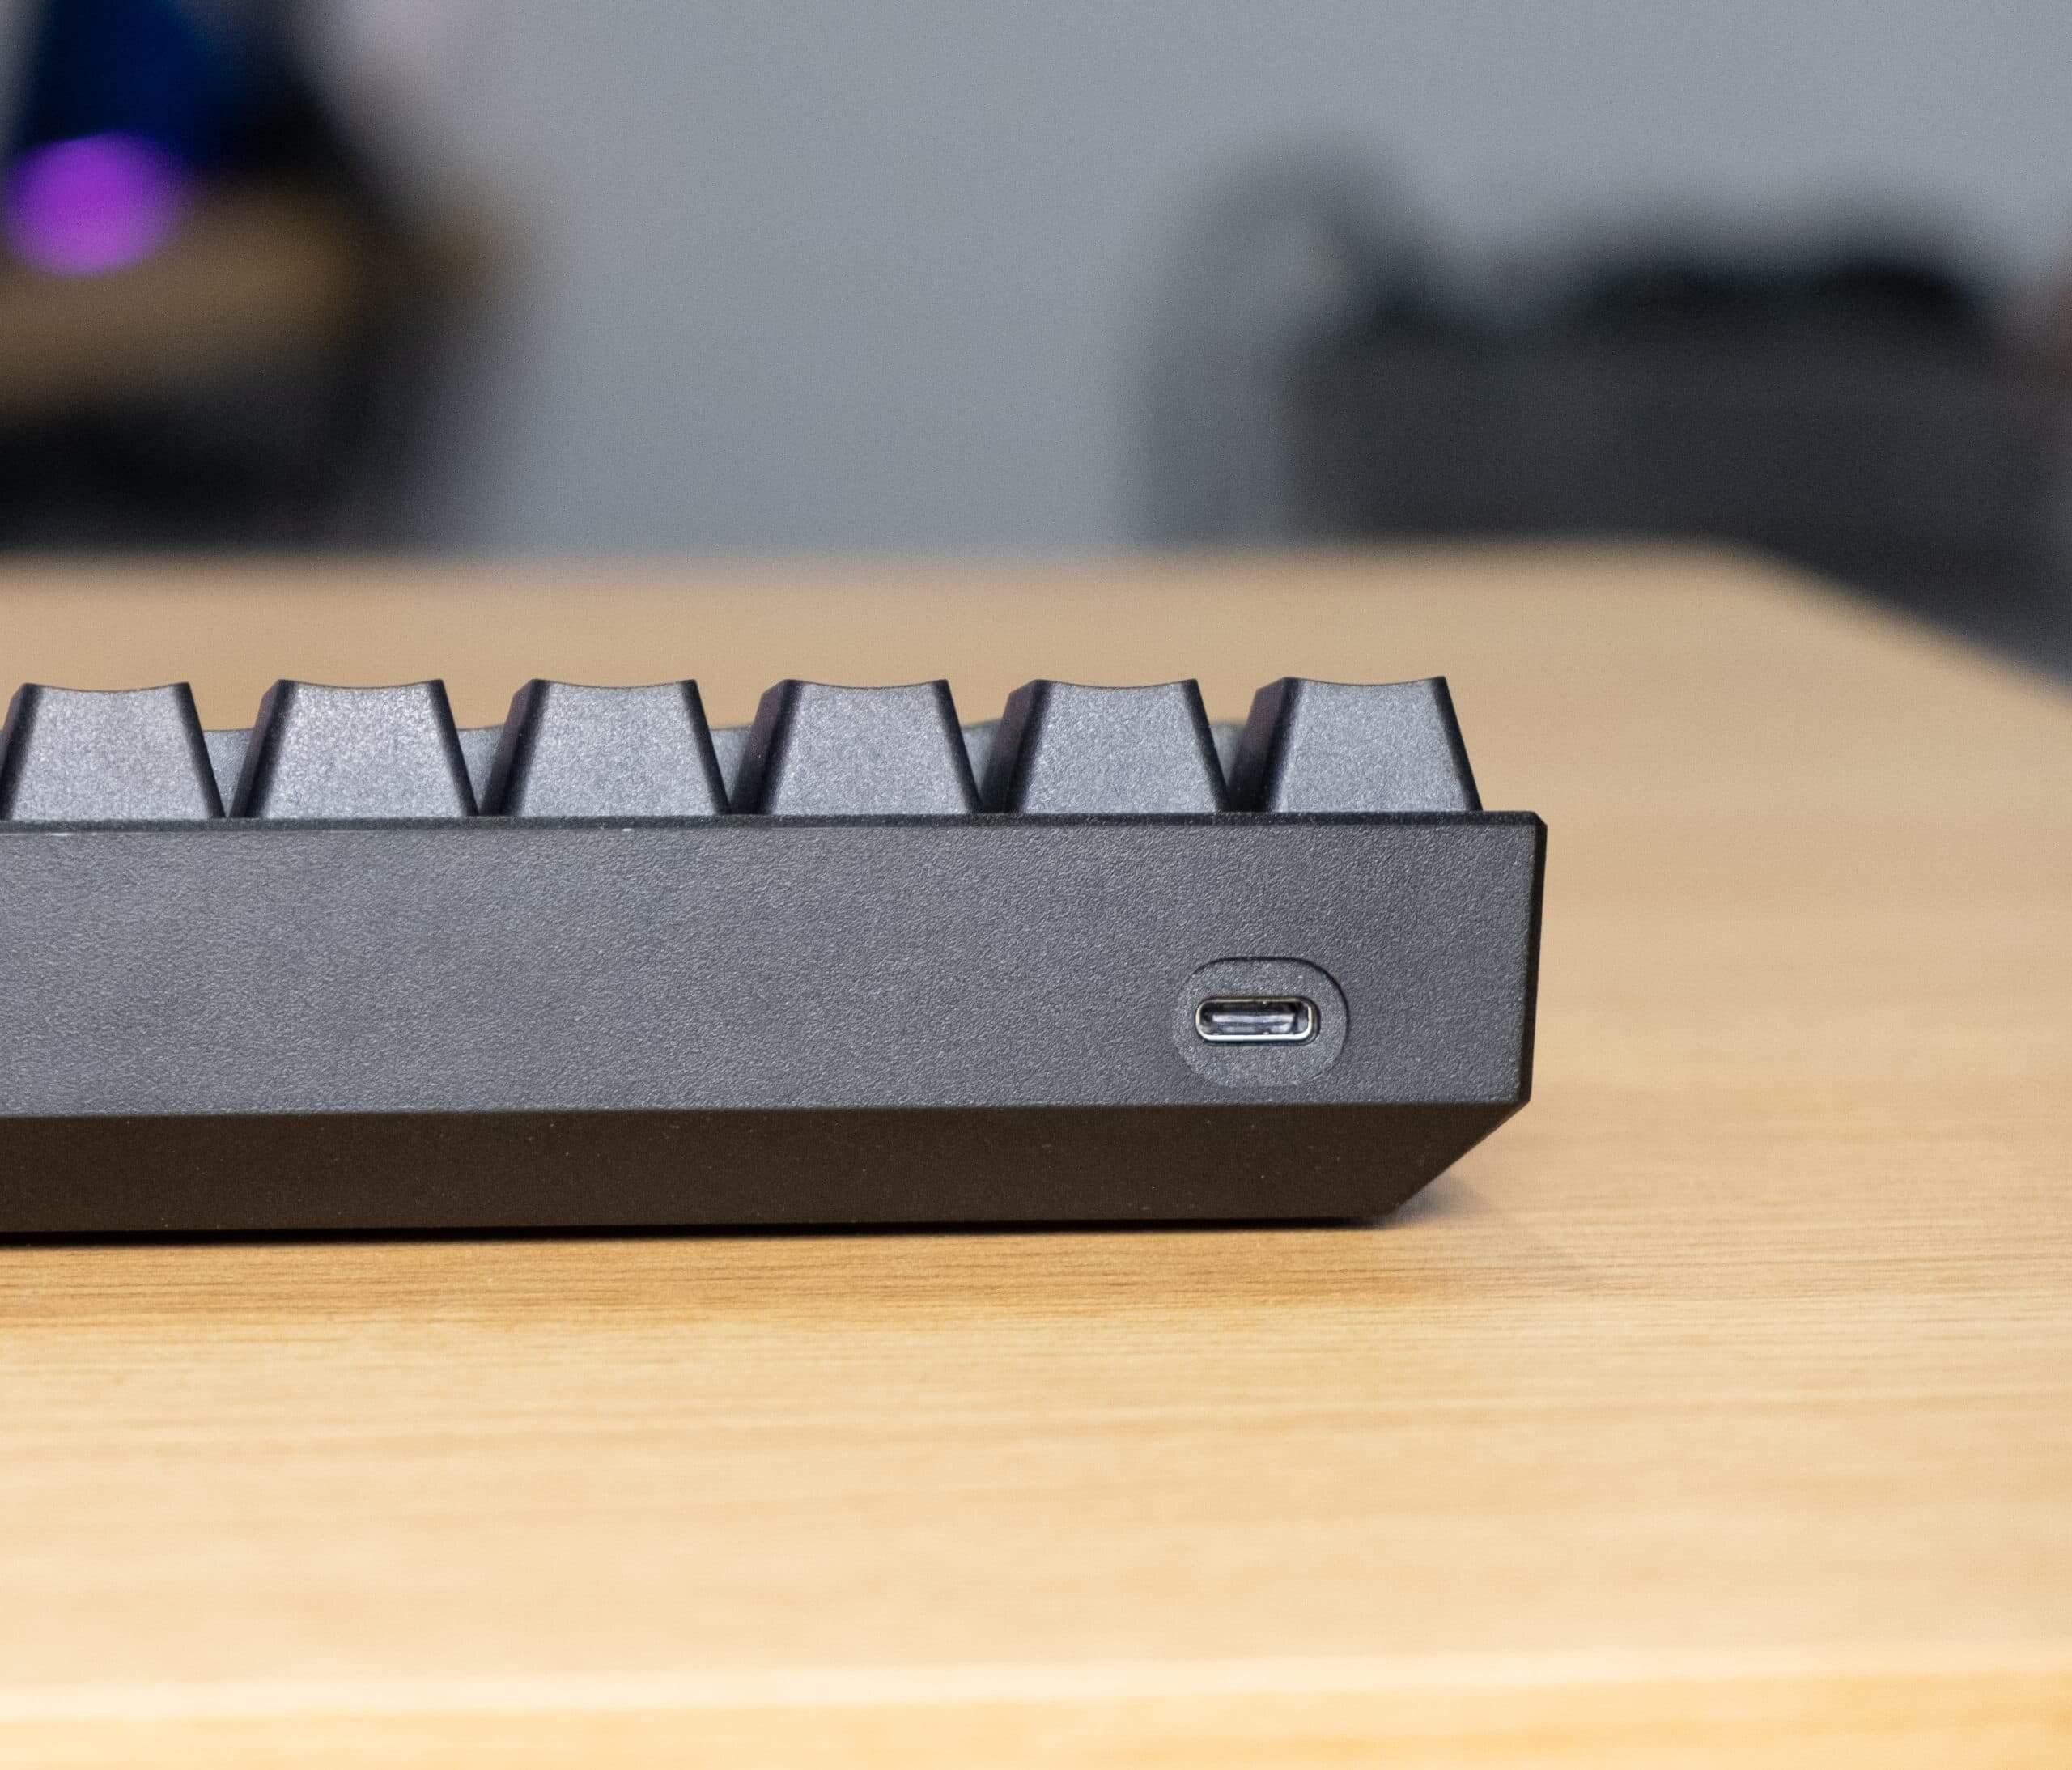 Anne Pro 2 - Cổng USB C